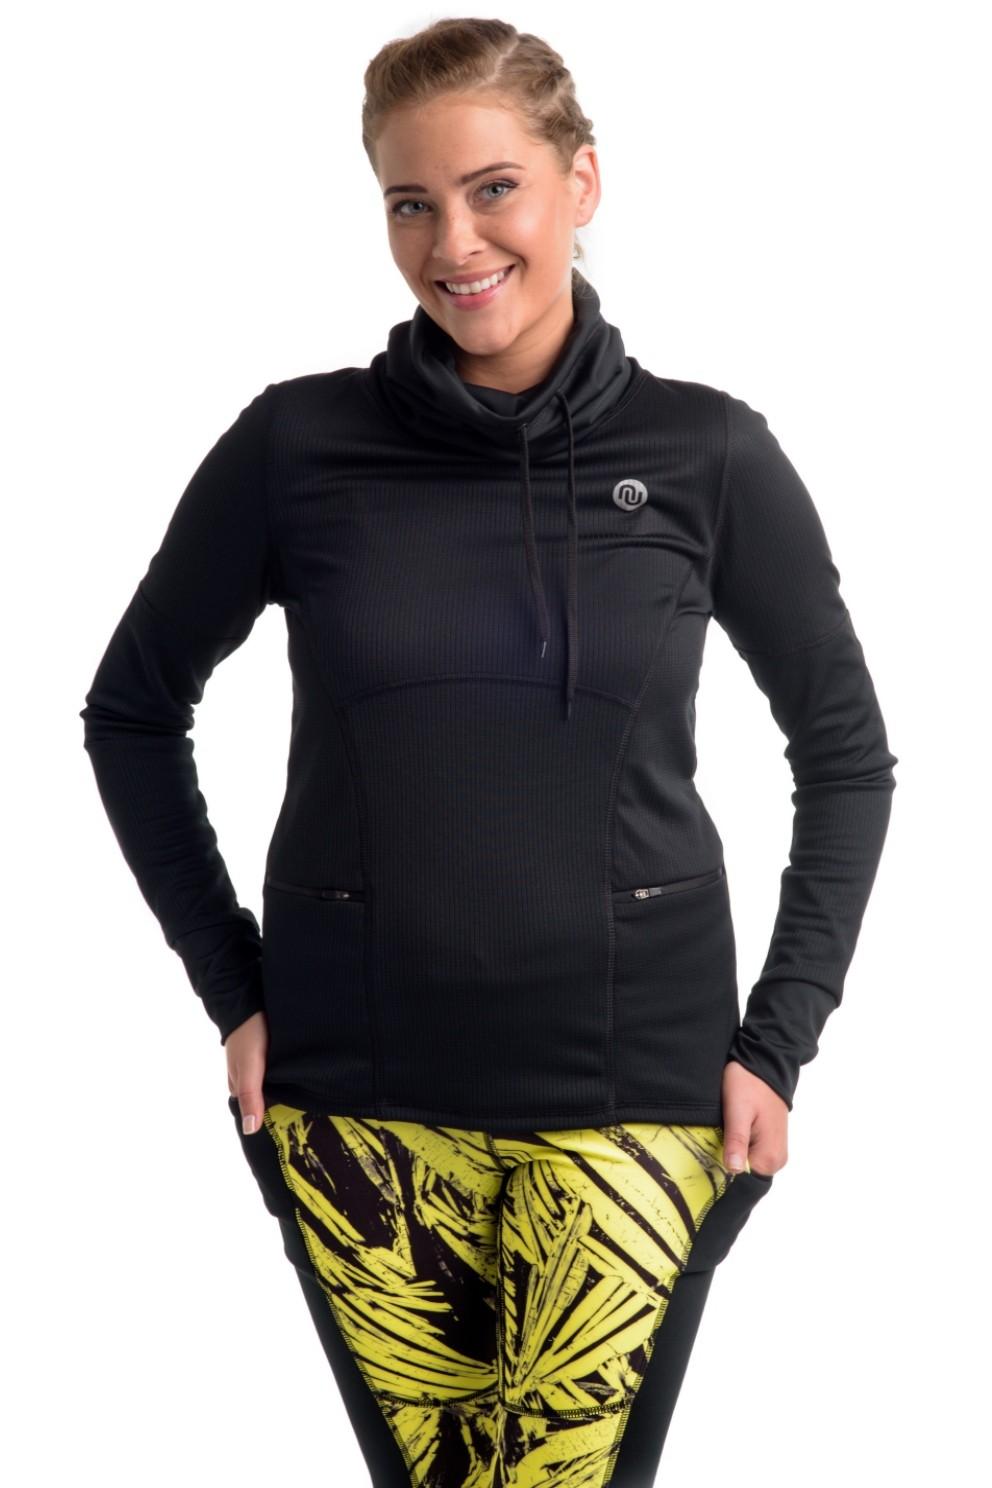 Nessi Damen Sweatshirt OBOD Jogging Fitness Atmungsaktiv ...